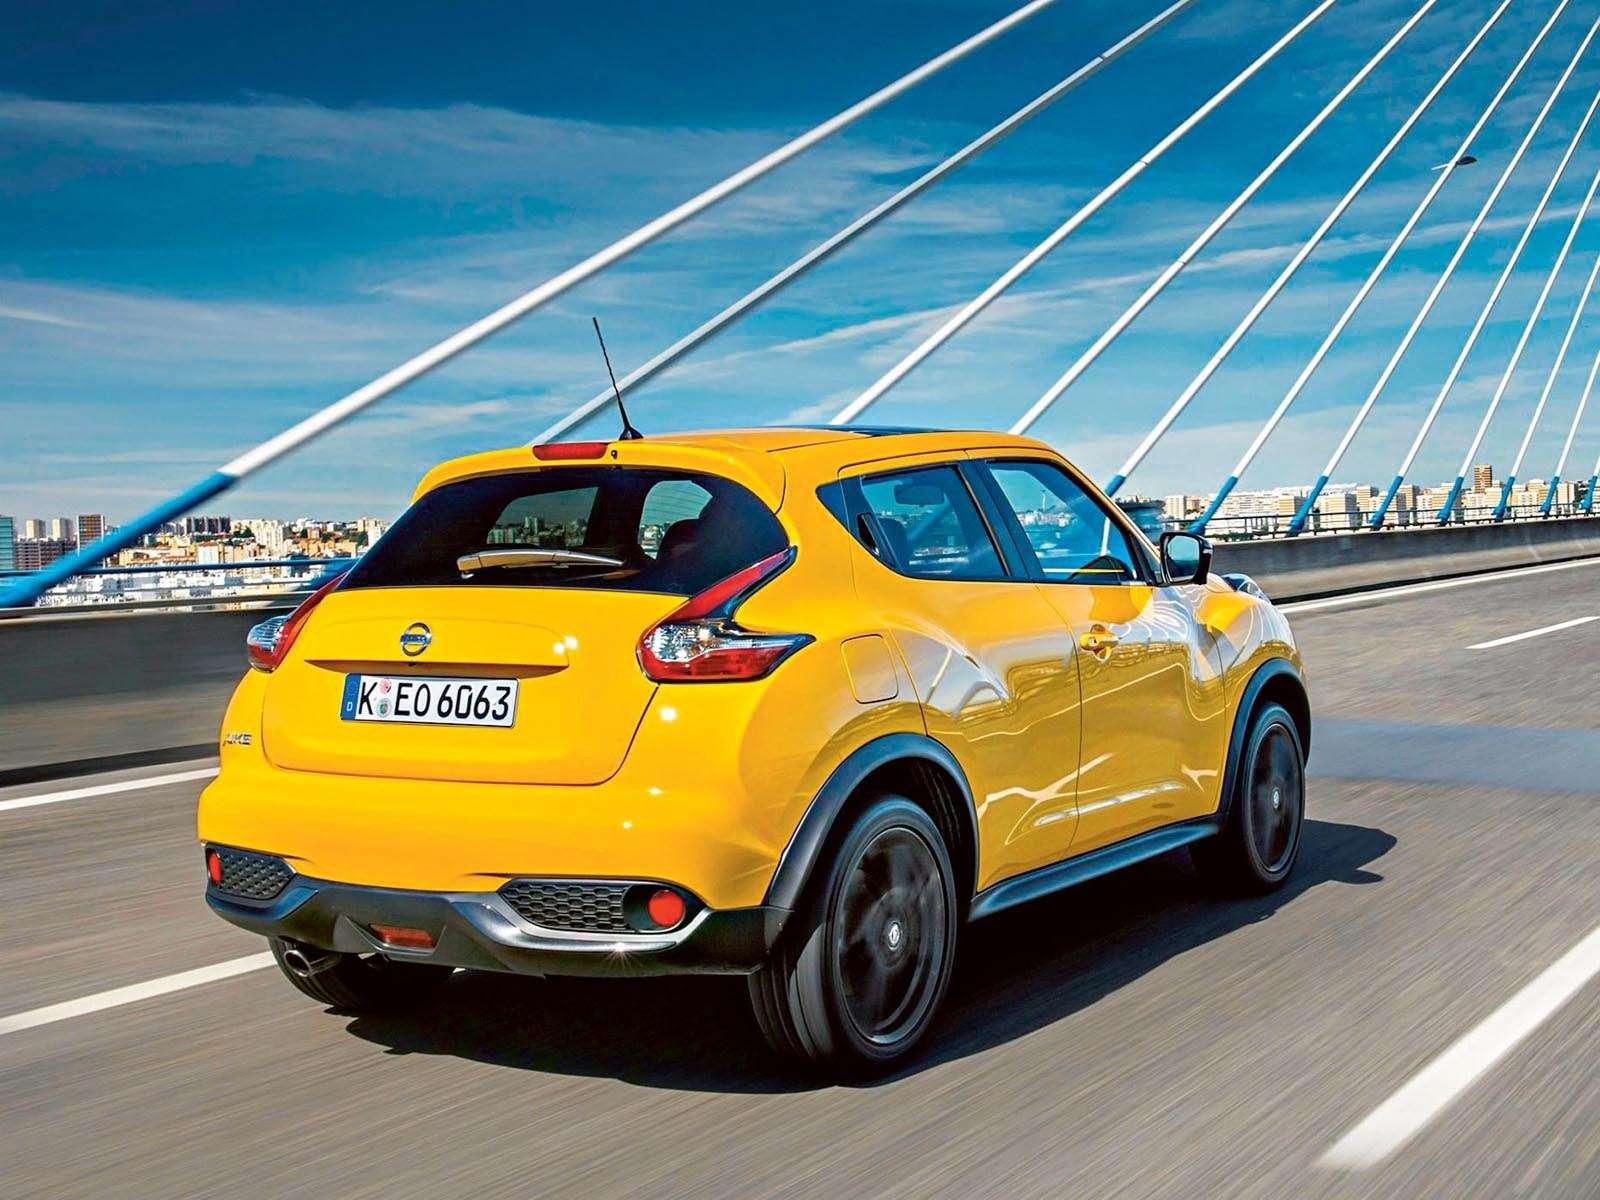 Nissan-Juke_2015_1600x1200_wallpaper_3c